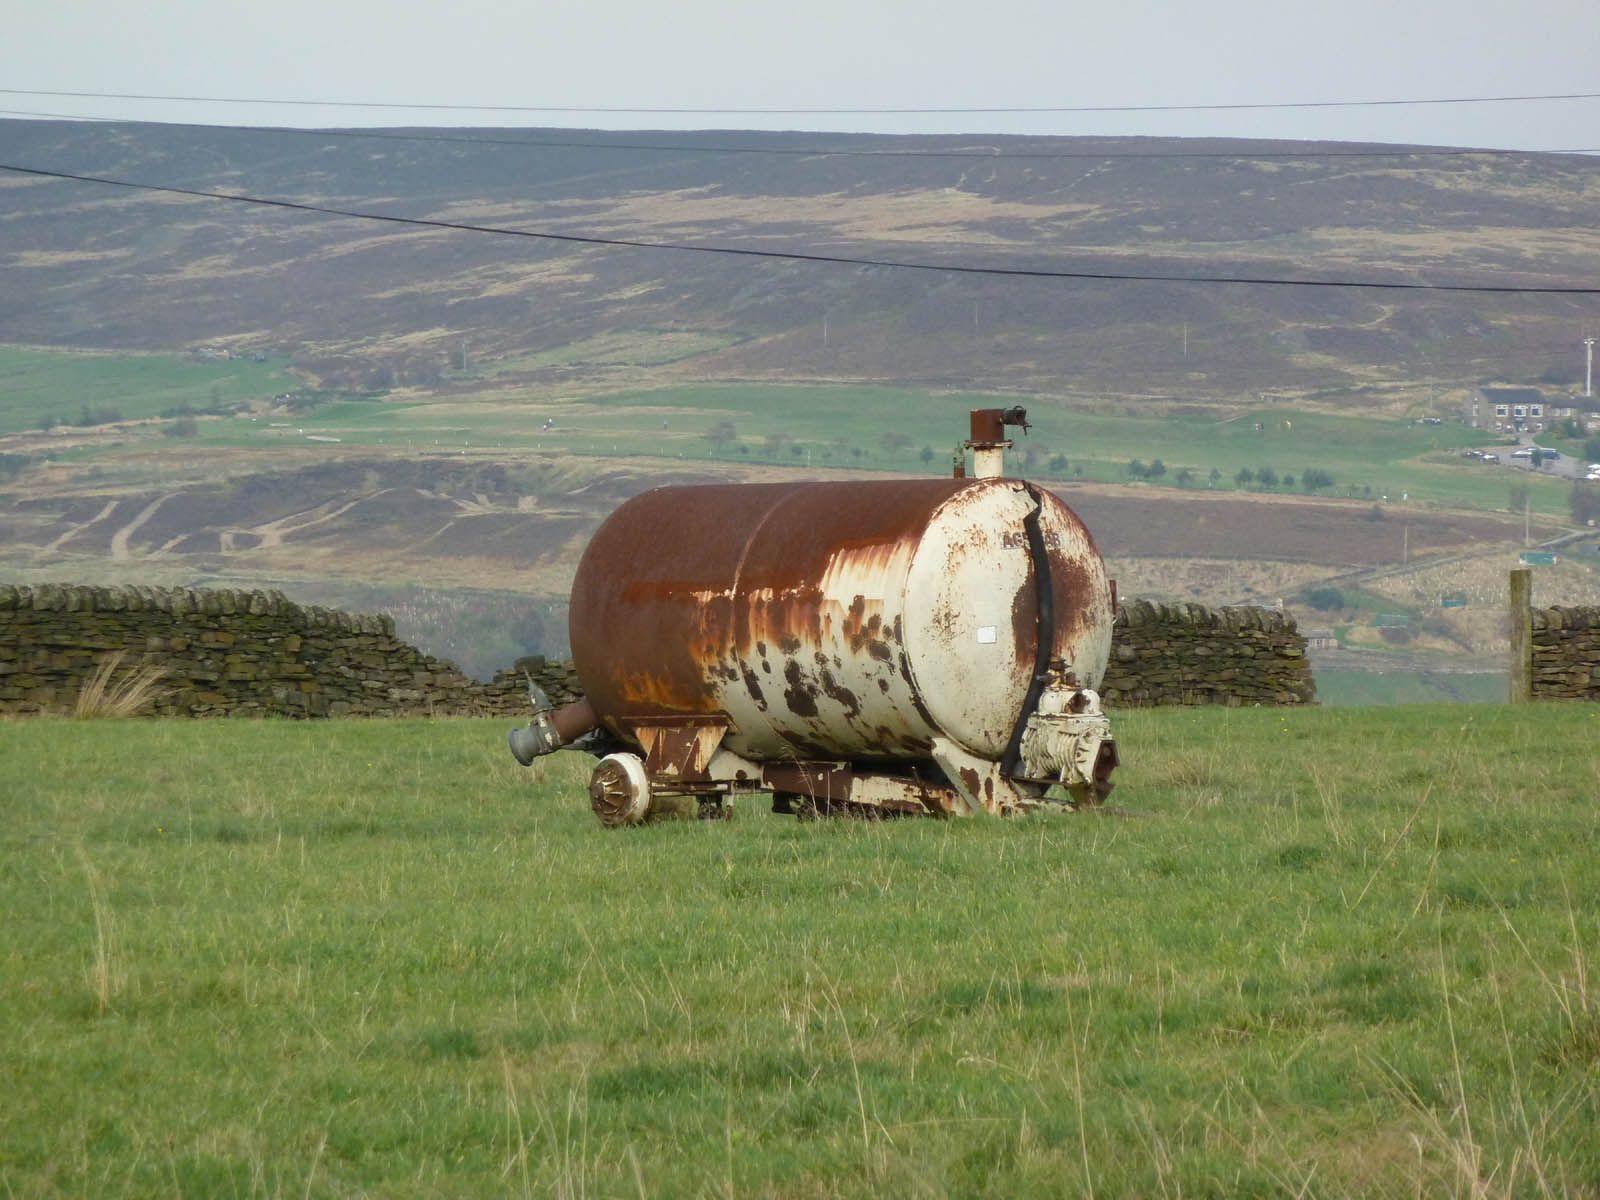 Muck spreader, gently rusting on Pennine hills.